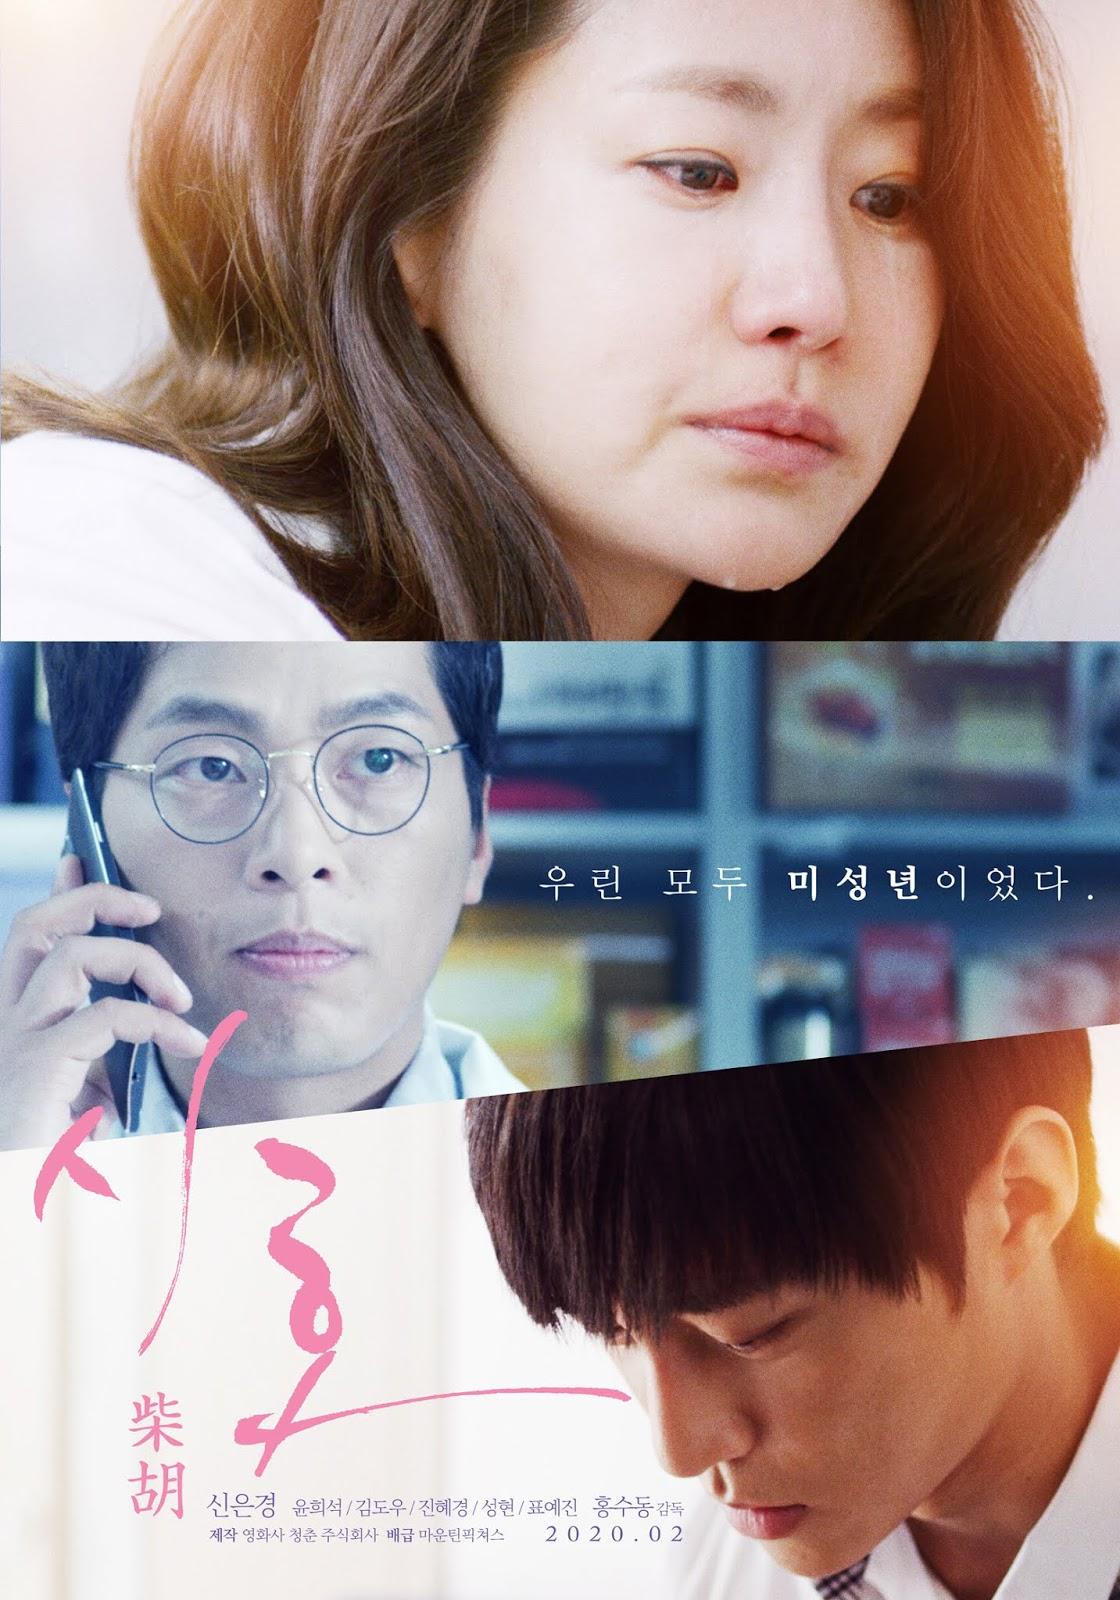 Shiho Full Korea 18+ Adult Movie Online Free